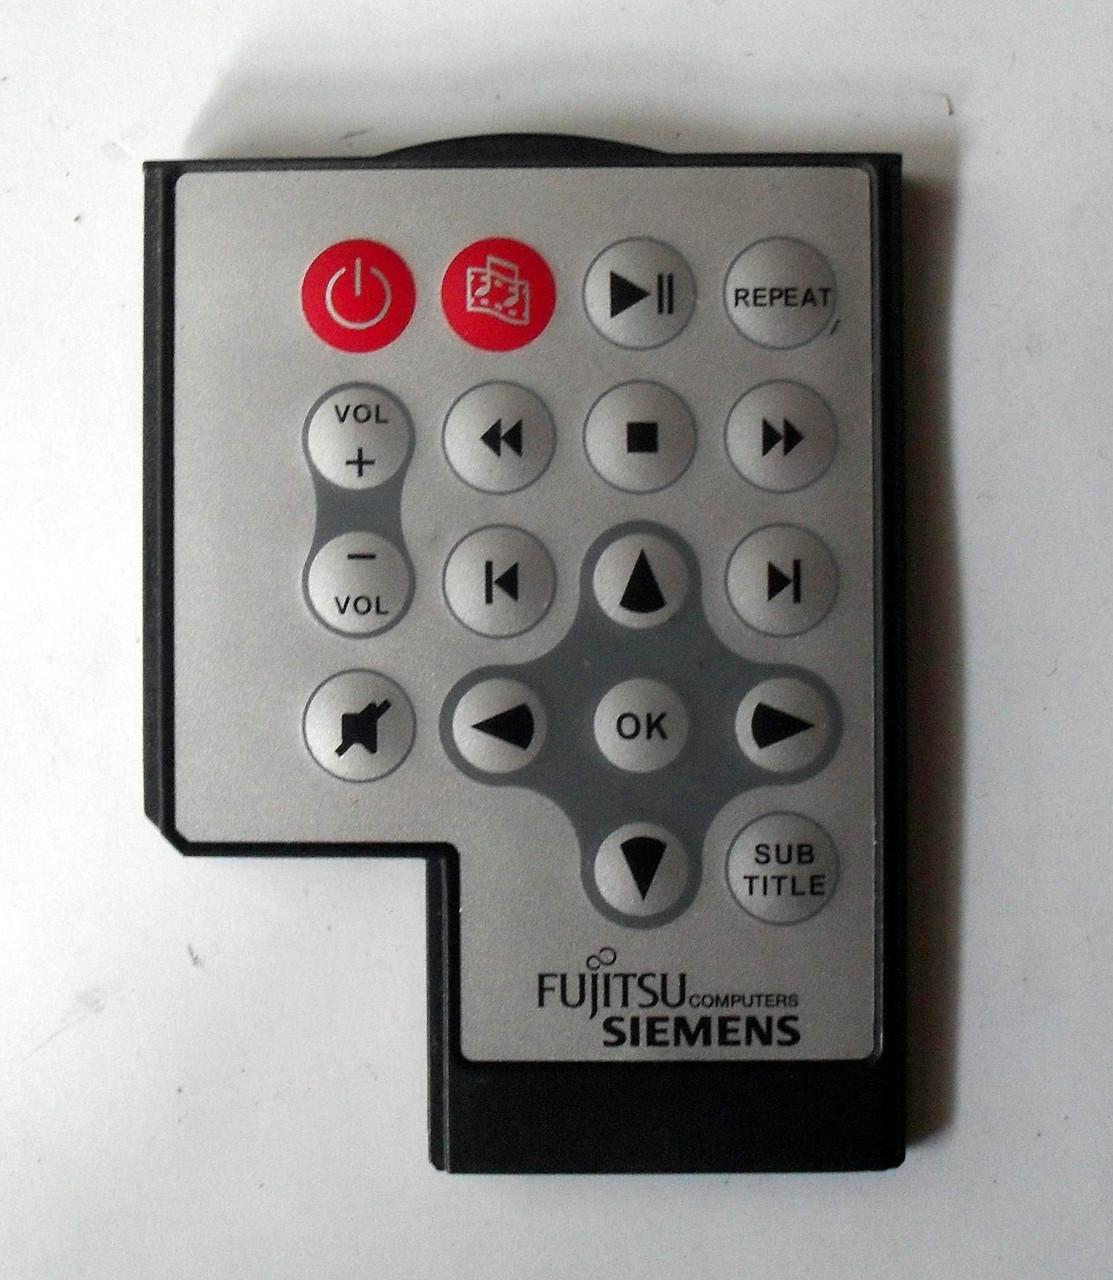 191 Пульт ПДУ Fujitsu-Siemens A1667G M1437G M3438G - RC106